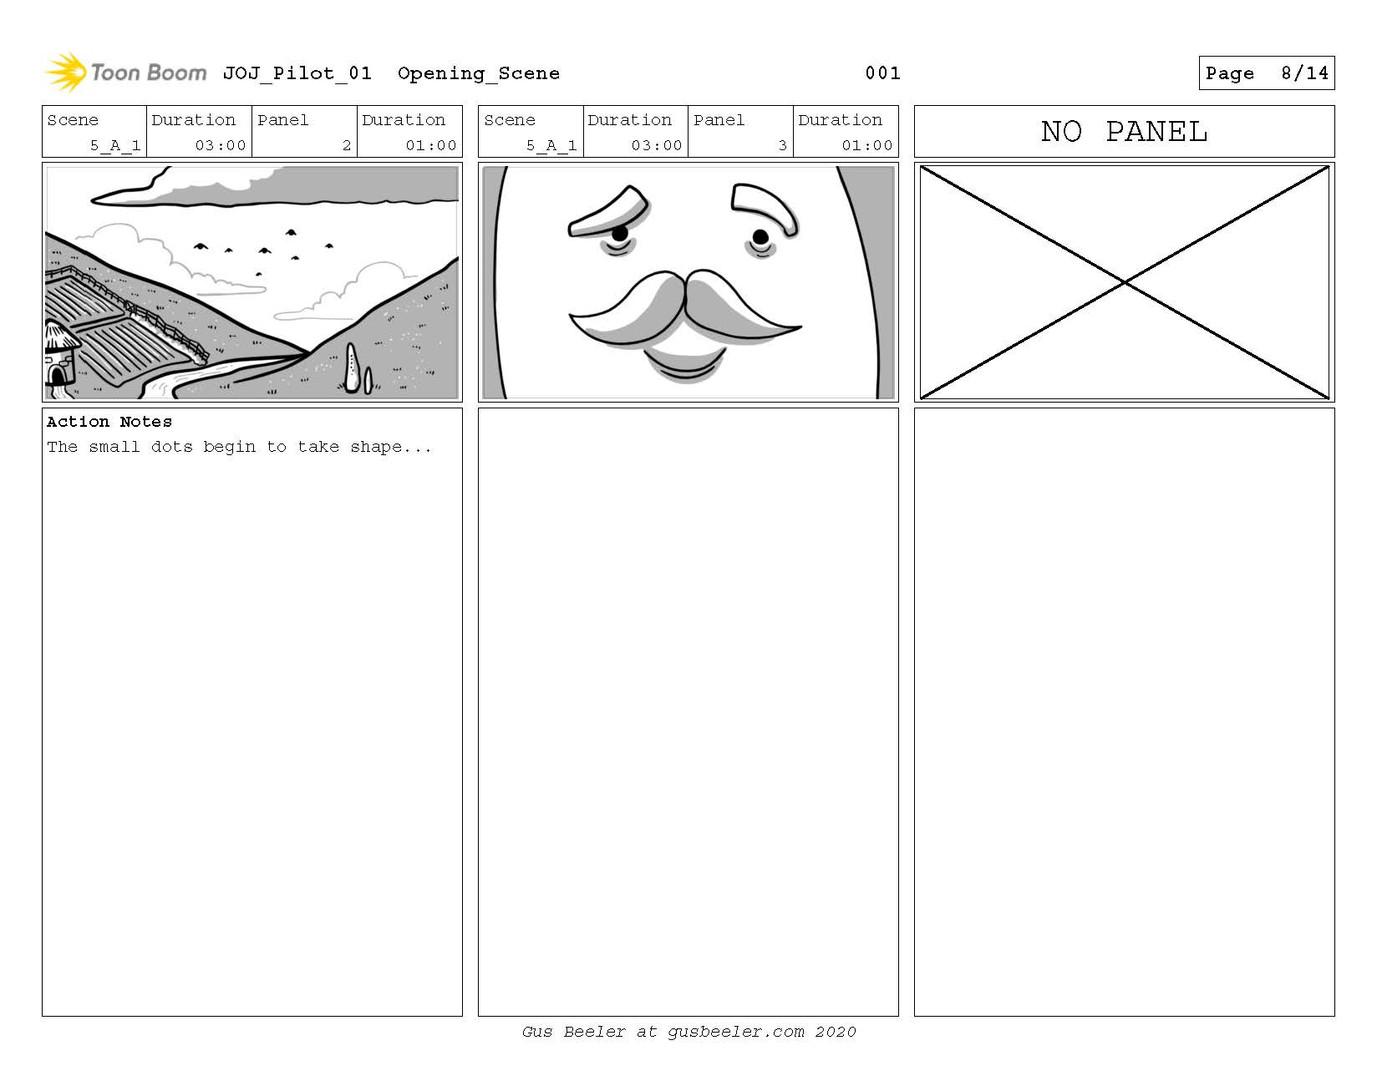 Abeeler_JOJ_Pilot_002_Page_09.jpg